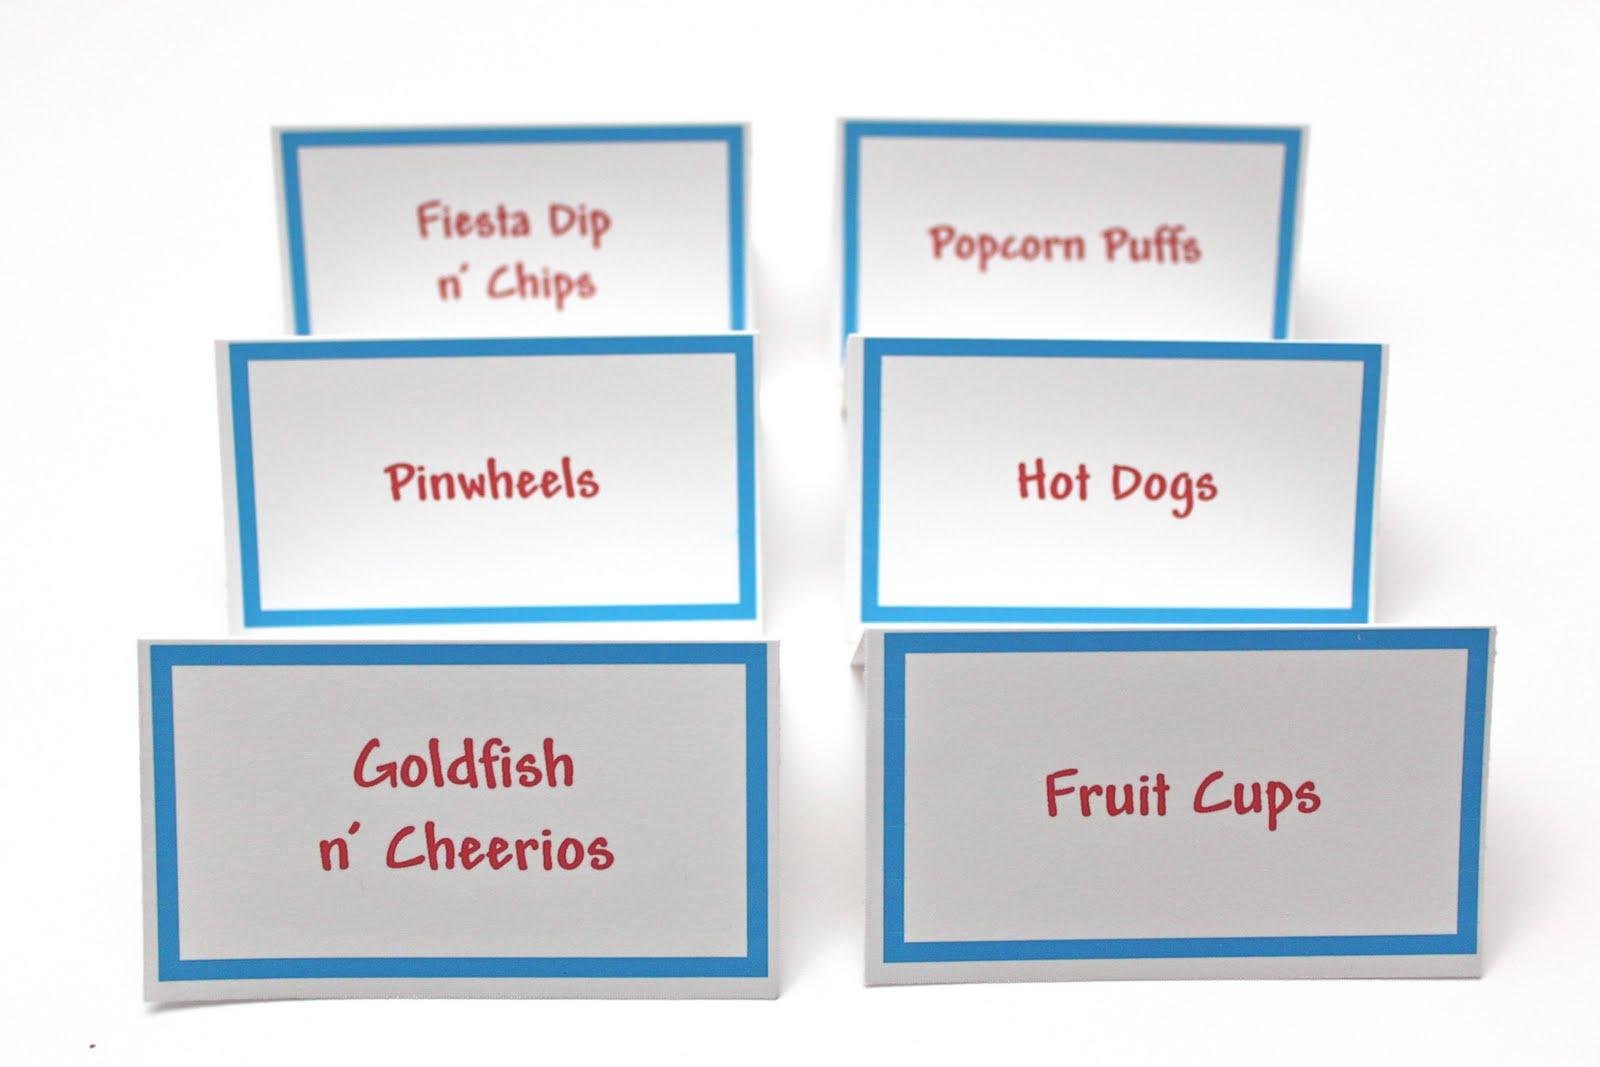 008 Img 1780 Jpg Template Ideas Free Printable Tent Cards ~ Ulyssesroom - Free Printable Food Tent Cards